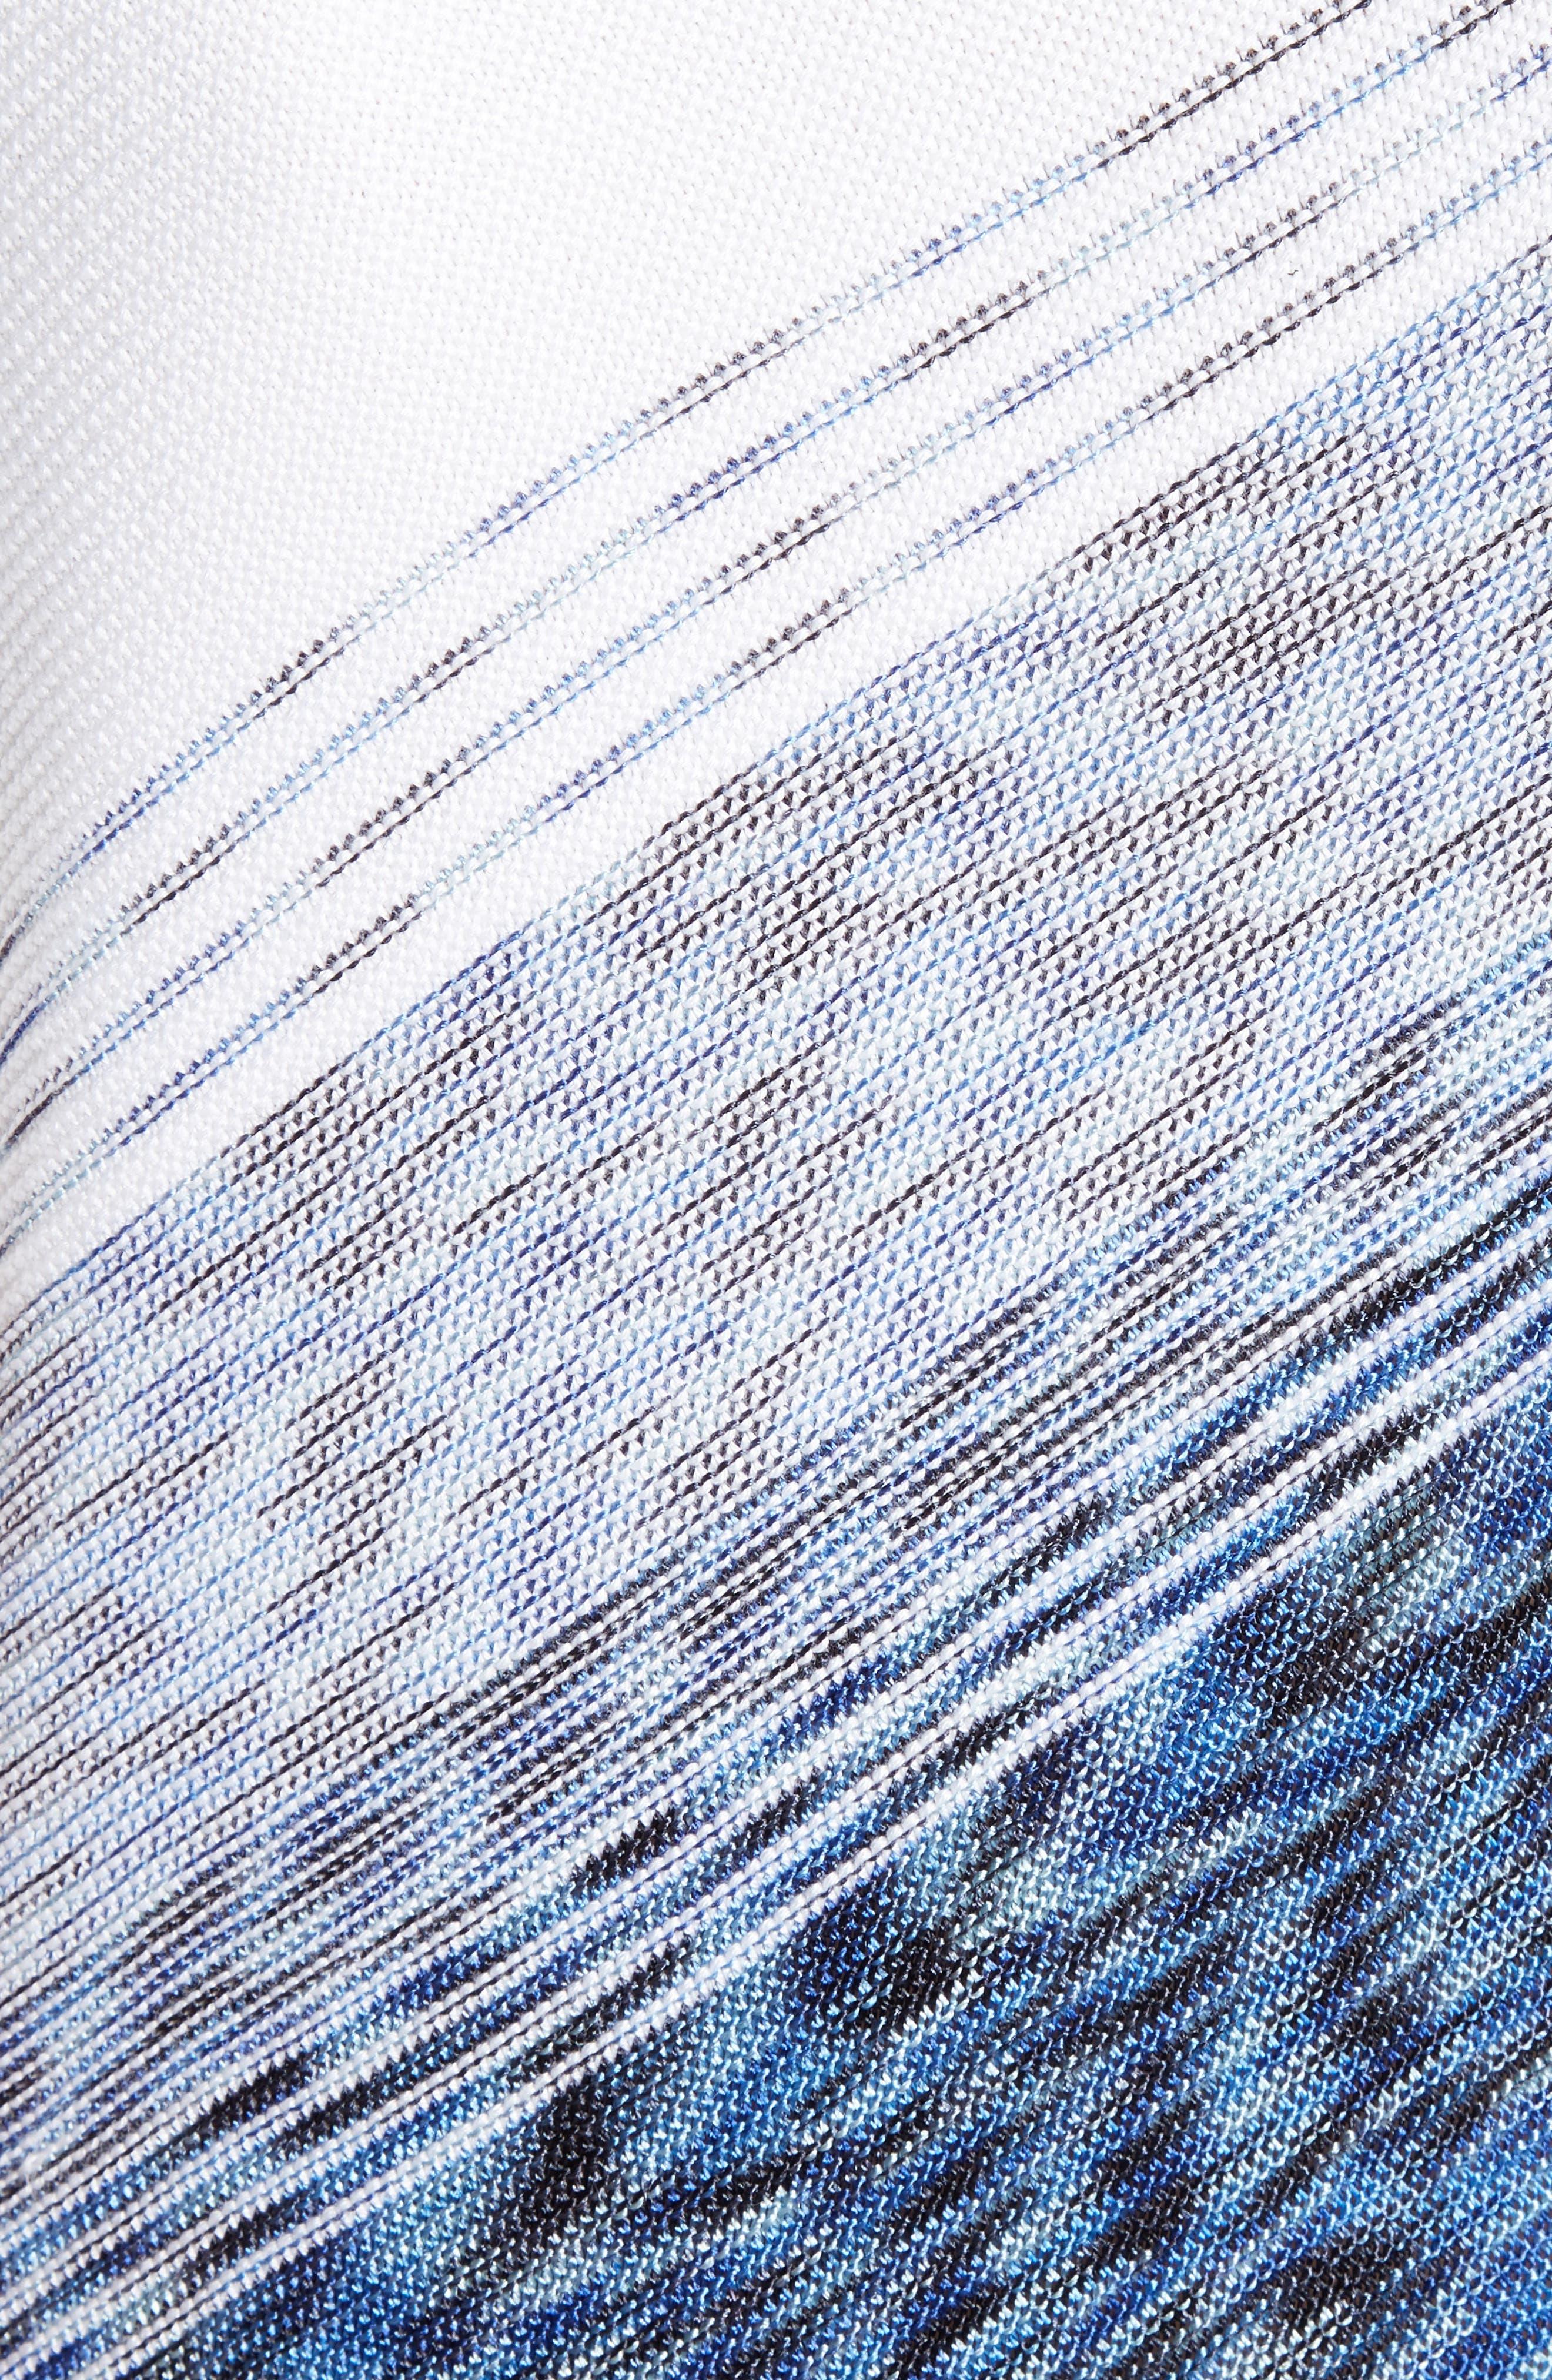 Dégradé Chambray Asymmetrical Sweater,                             Alternate thumbnail 5, color,                             400